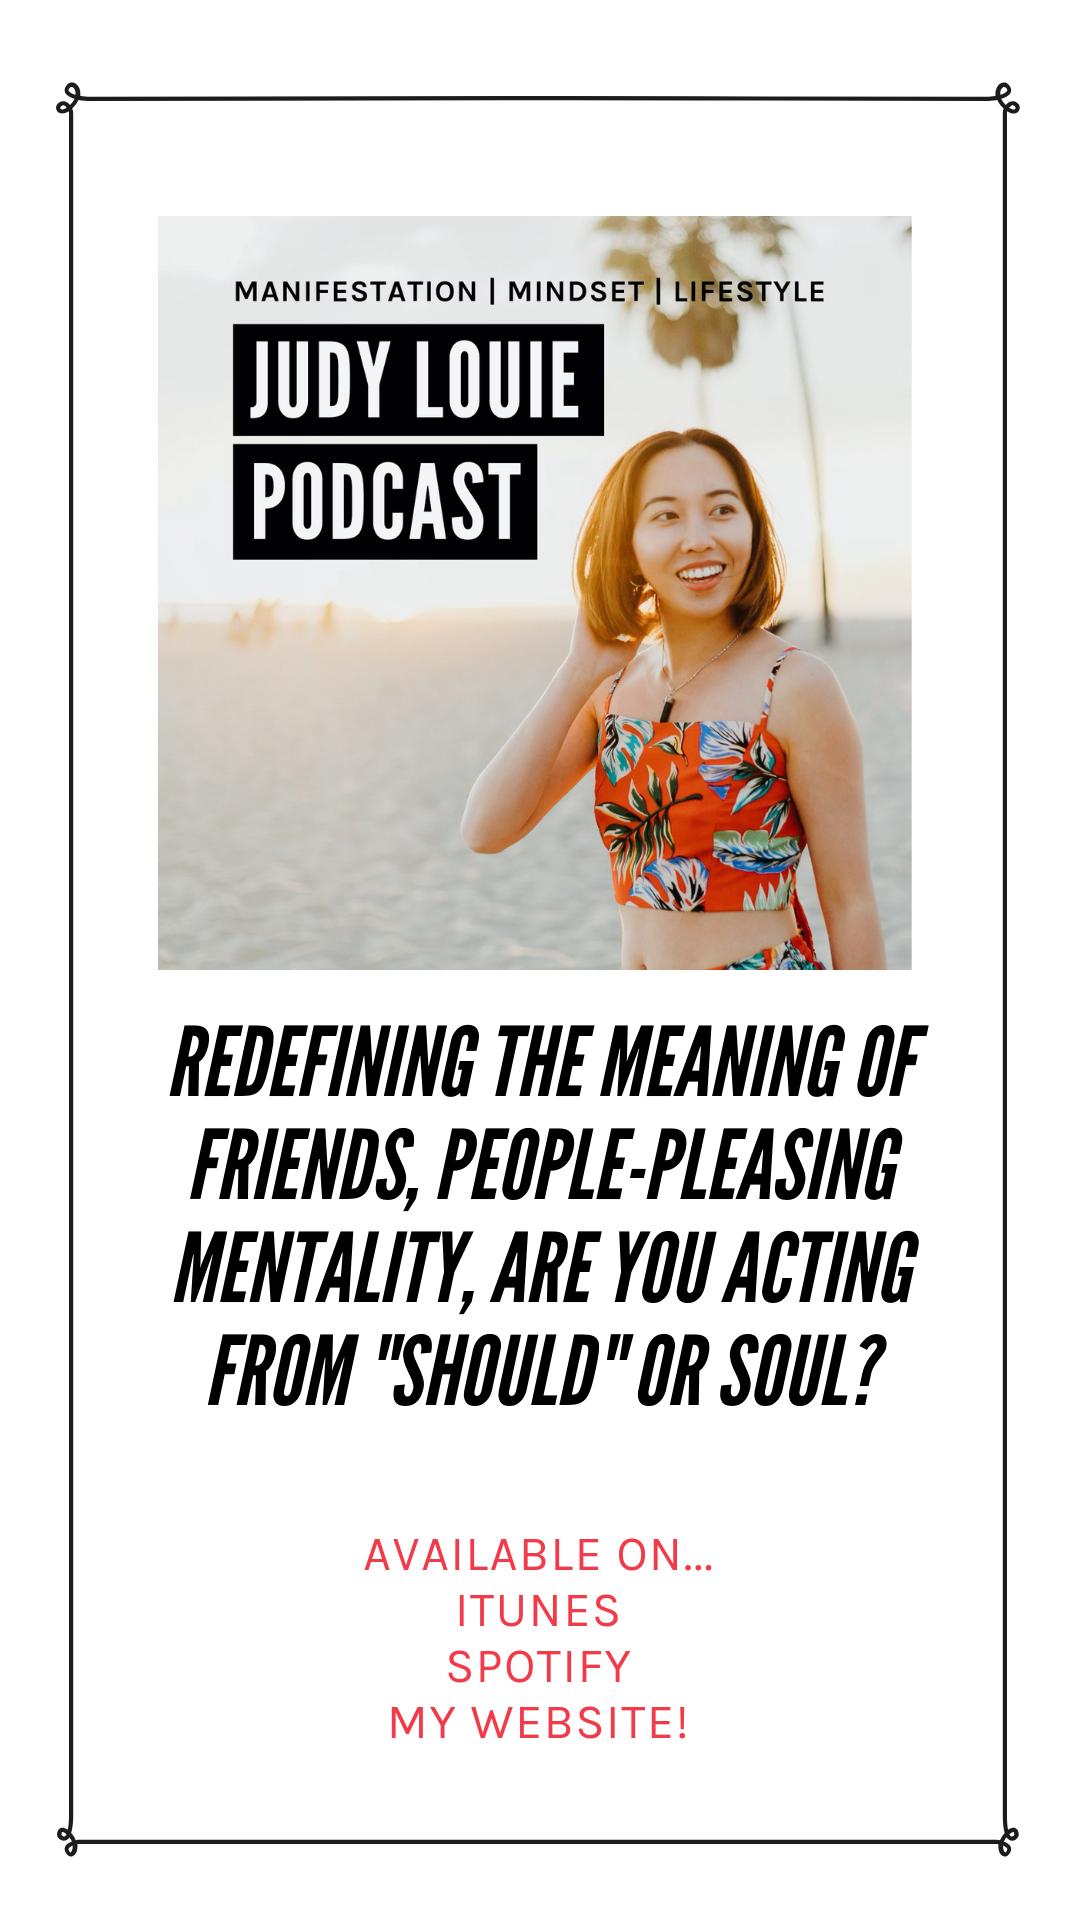 judy louie podcast - should vs soul.png